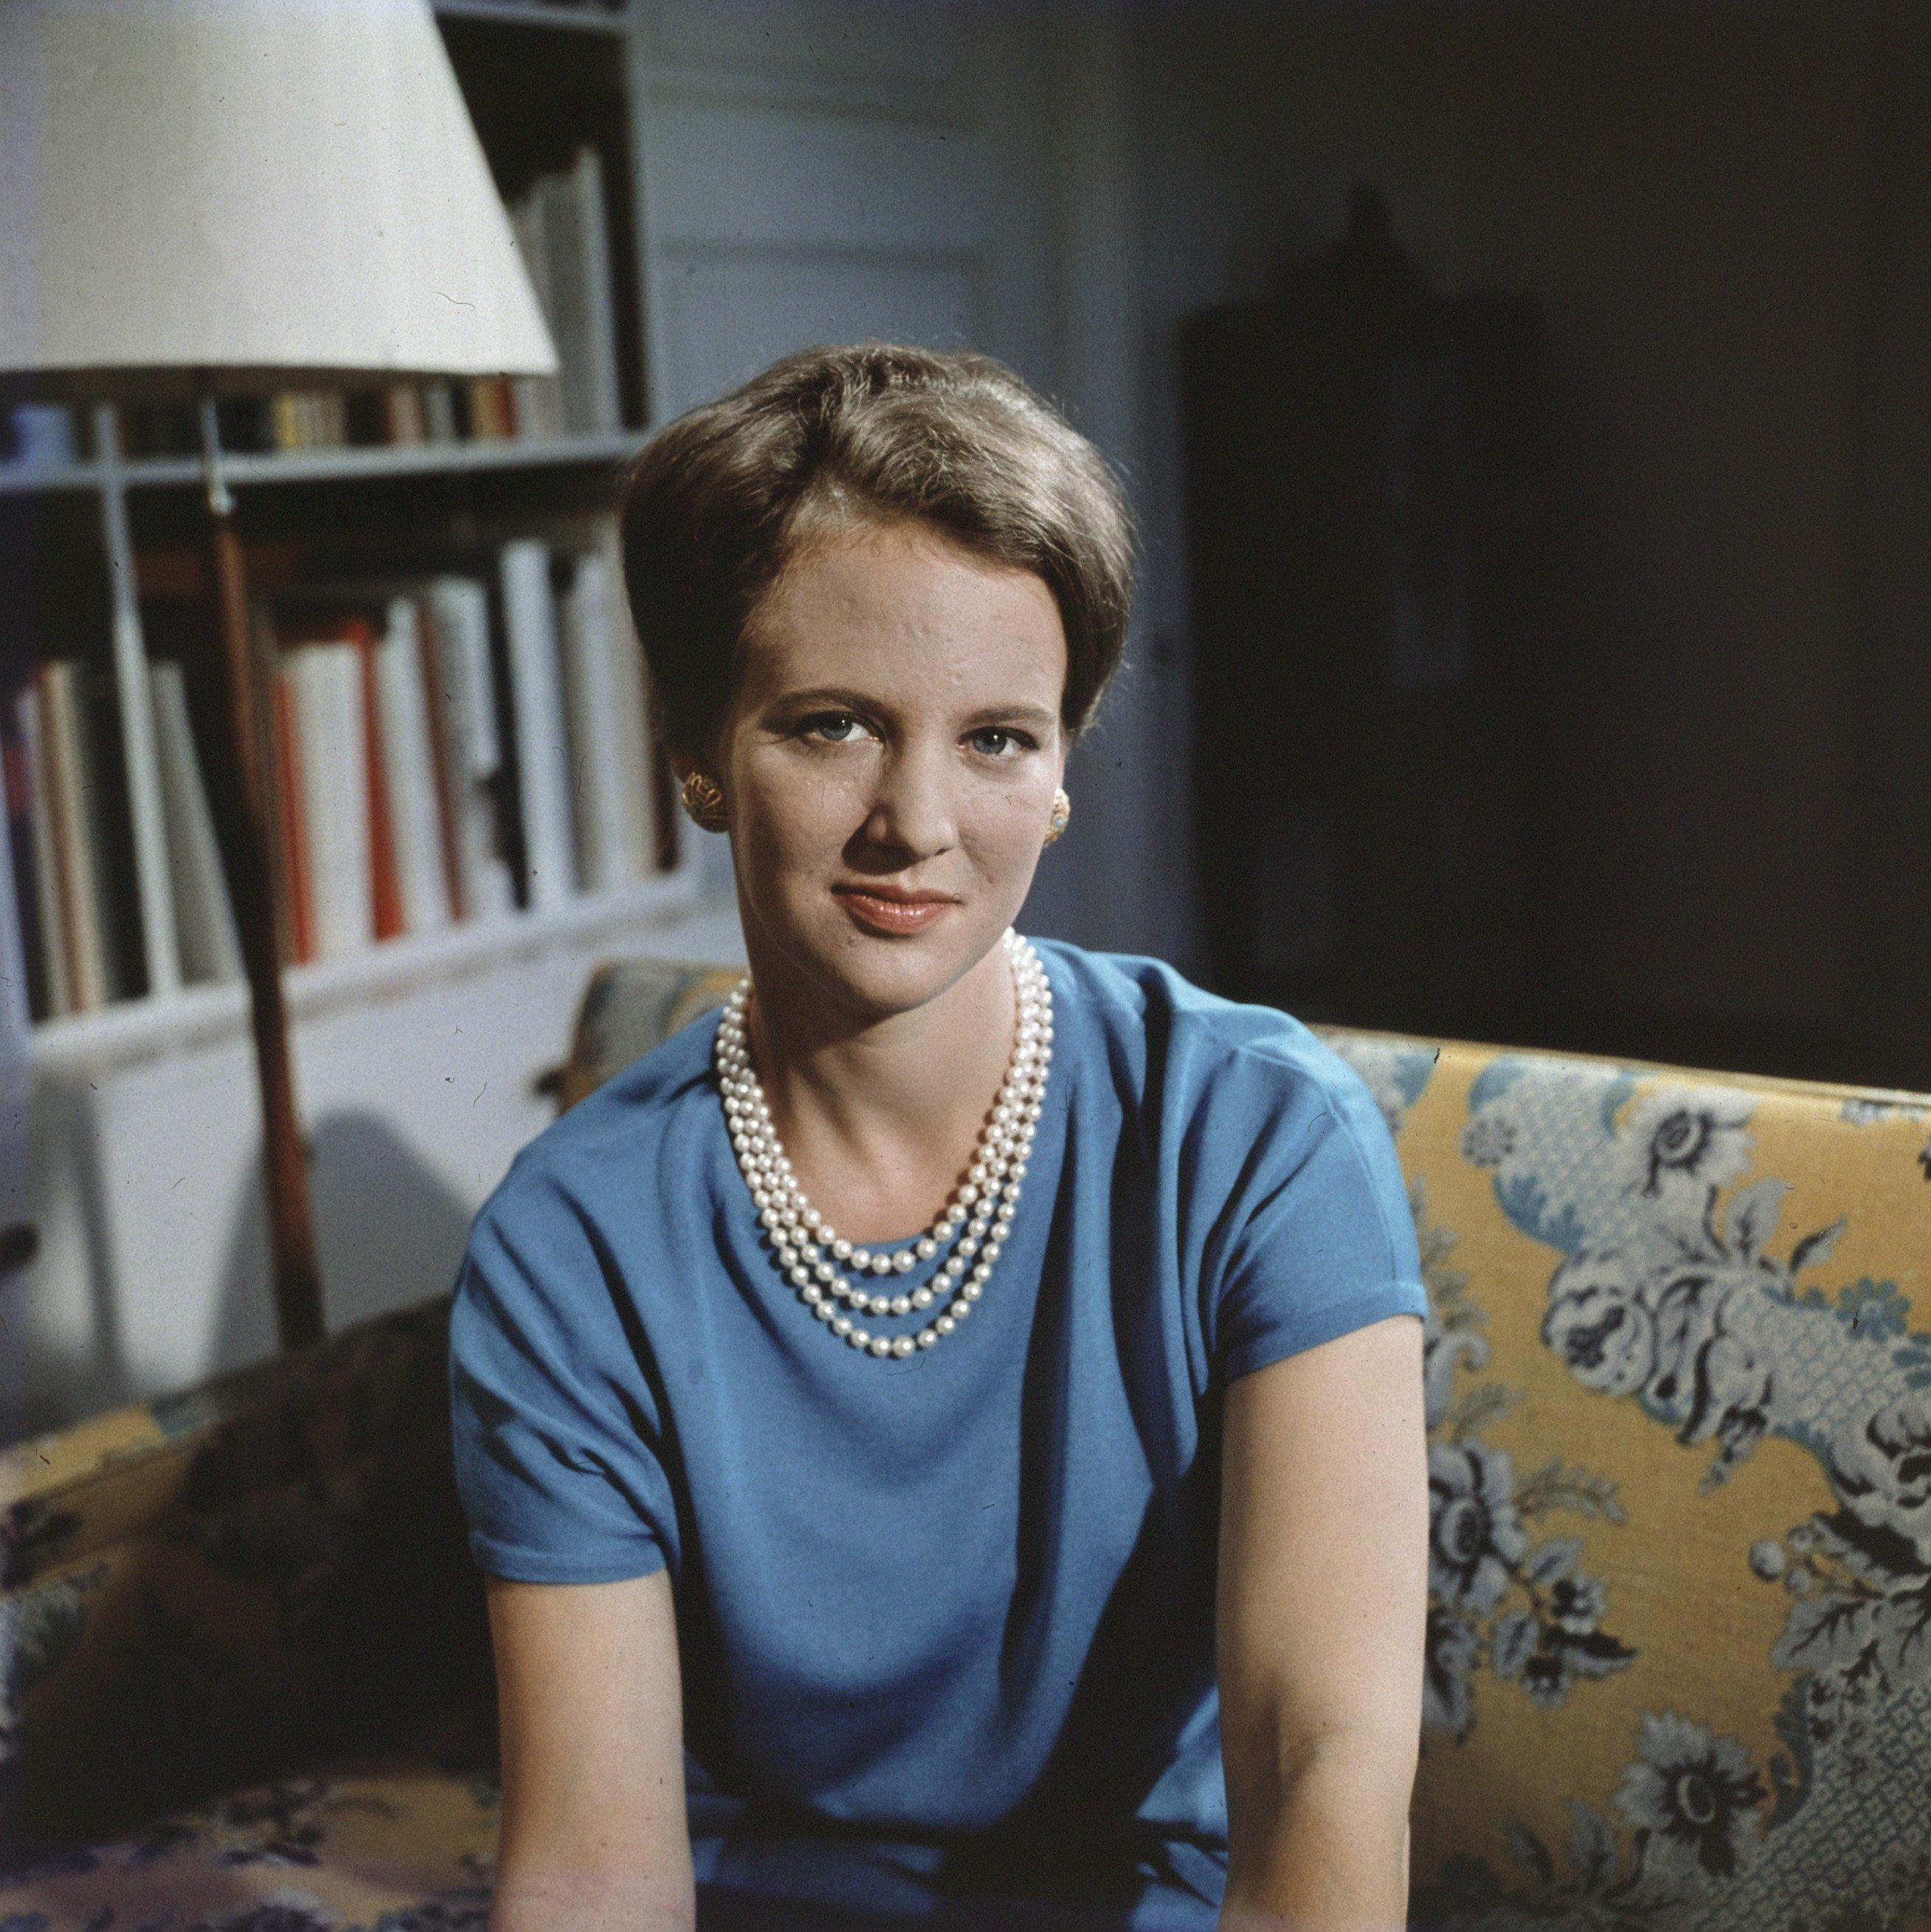 Princess Margrethe photographed on August 15, 1966. From the Dutch National Archives, The Hague, Fotocollectie Algemeen Nederlands Persbureau (ANeFo), 1945-1989, Nummer toegang 2.24.01.07 Bestanddeelnummer 254-7690.